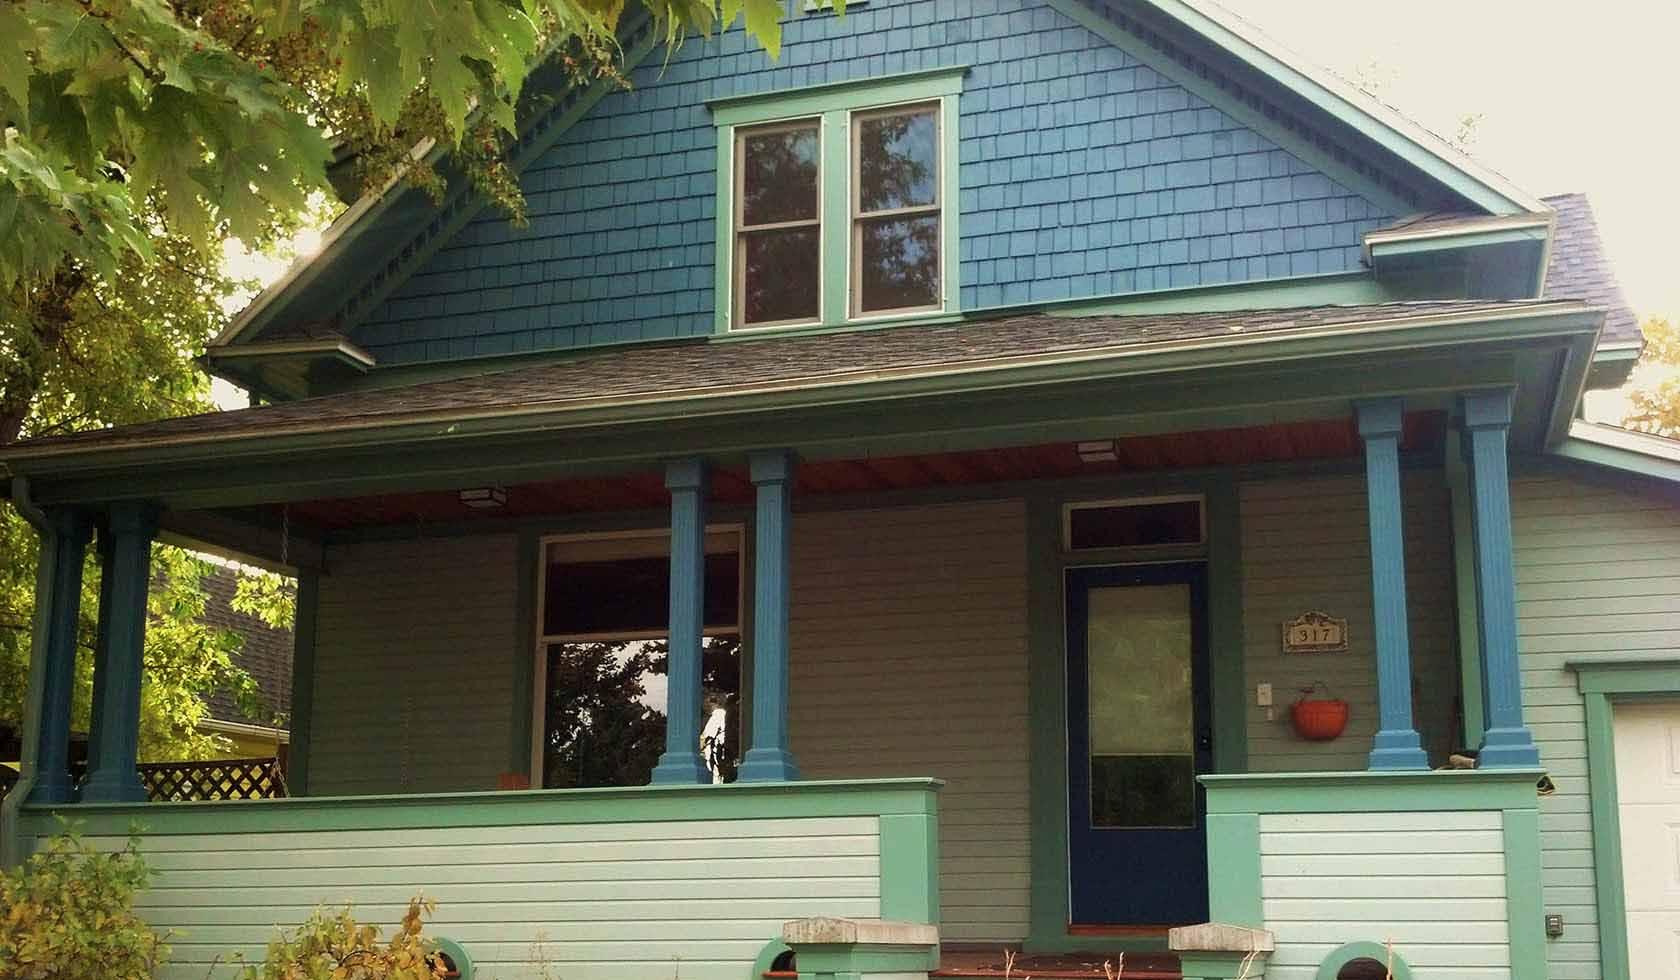 Bozeman Cottage Vacation Rentals profile image